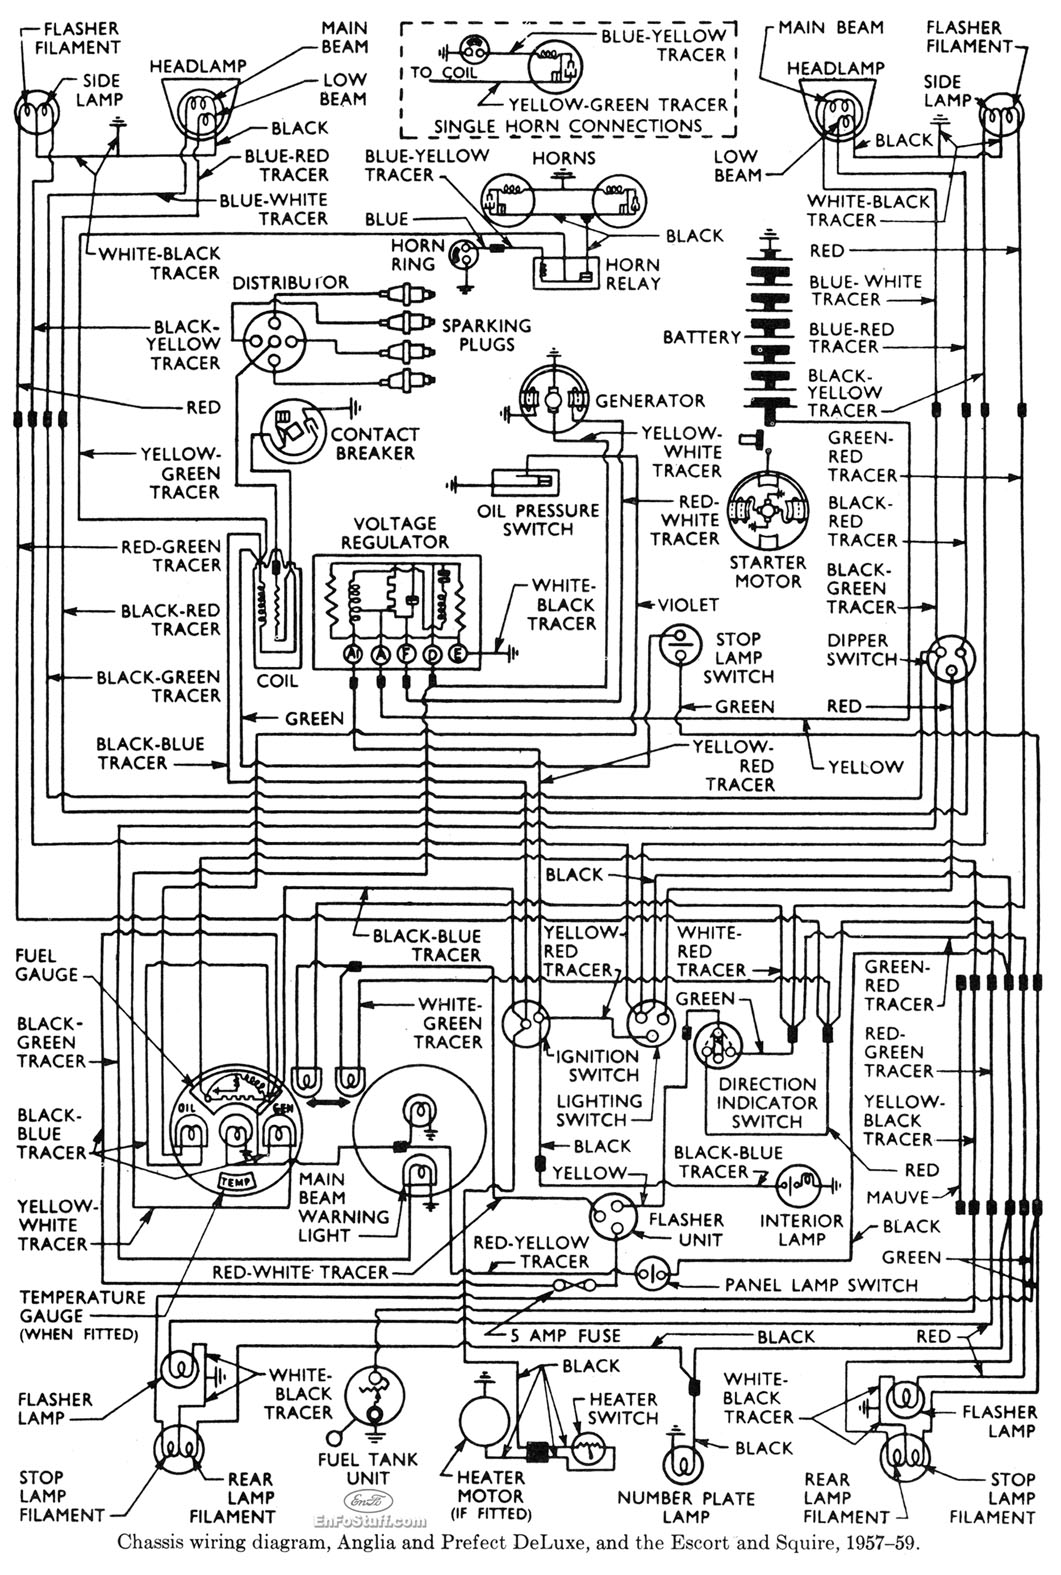 1987 Columbia Par Car Wiring Diagram Detailed Diagrams 48 Volt Ezgo Solenoid Manual Of U2022 Club Battery